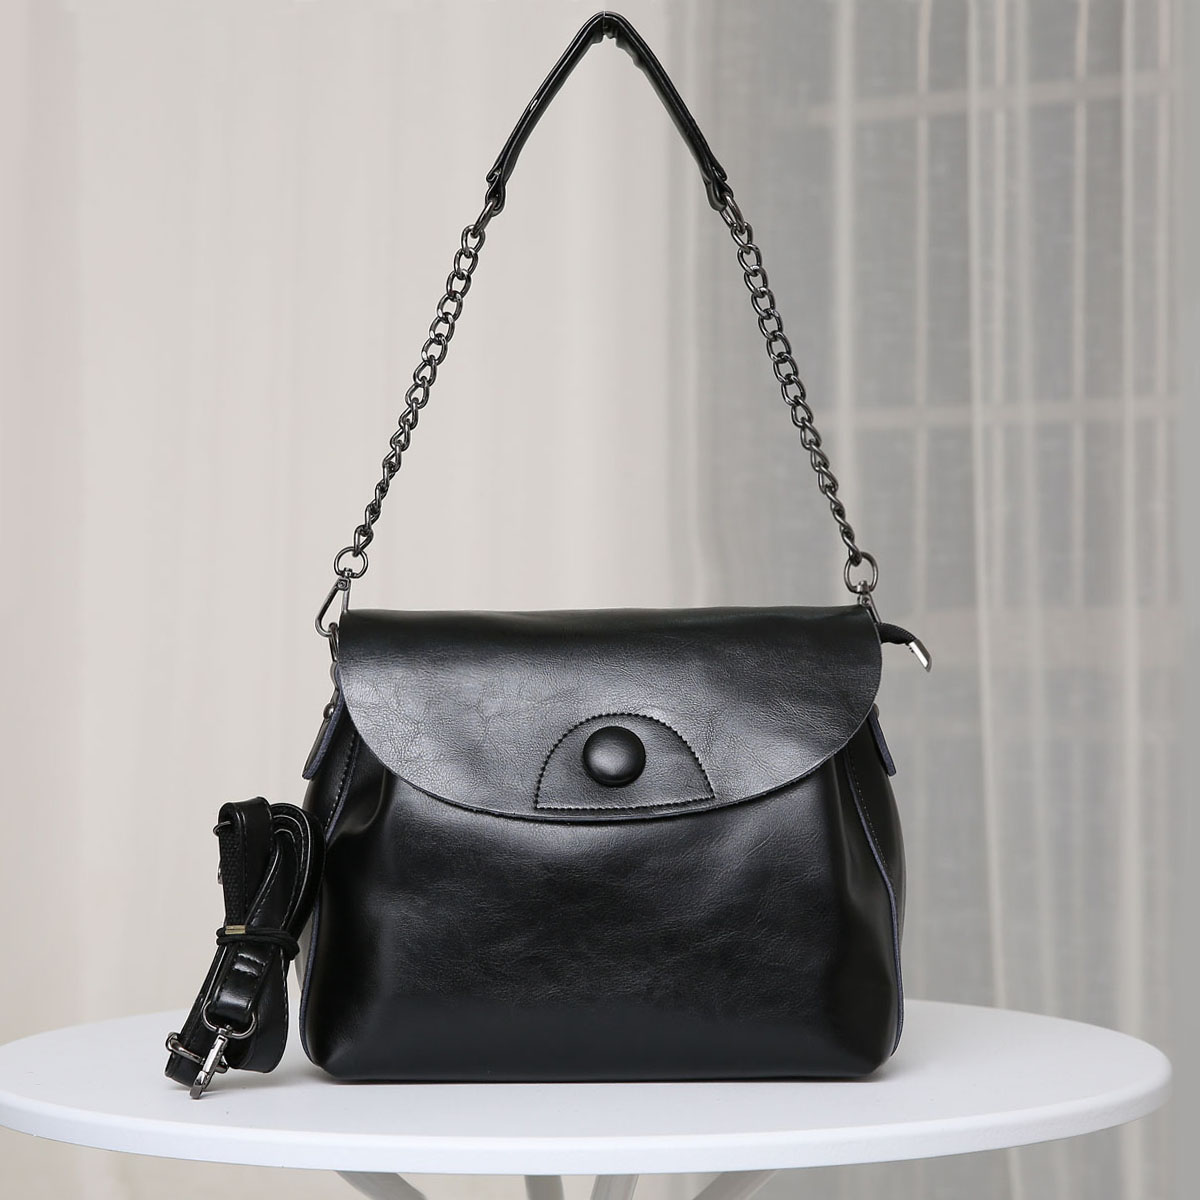 2017 New Simple 100% Genuine Leather Ladies Bags Female Shoulder Bag for Women Handbag Casual Retro Women\s Messenger Bags<br><br>Aliexpress